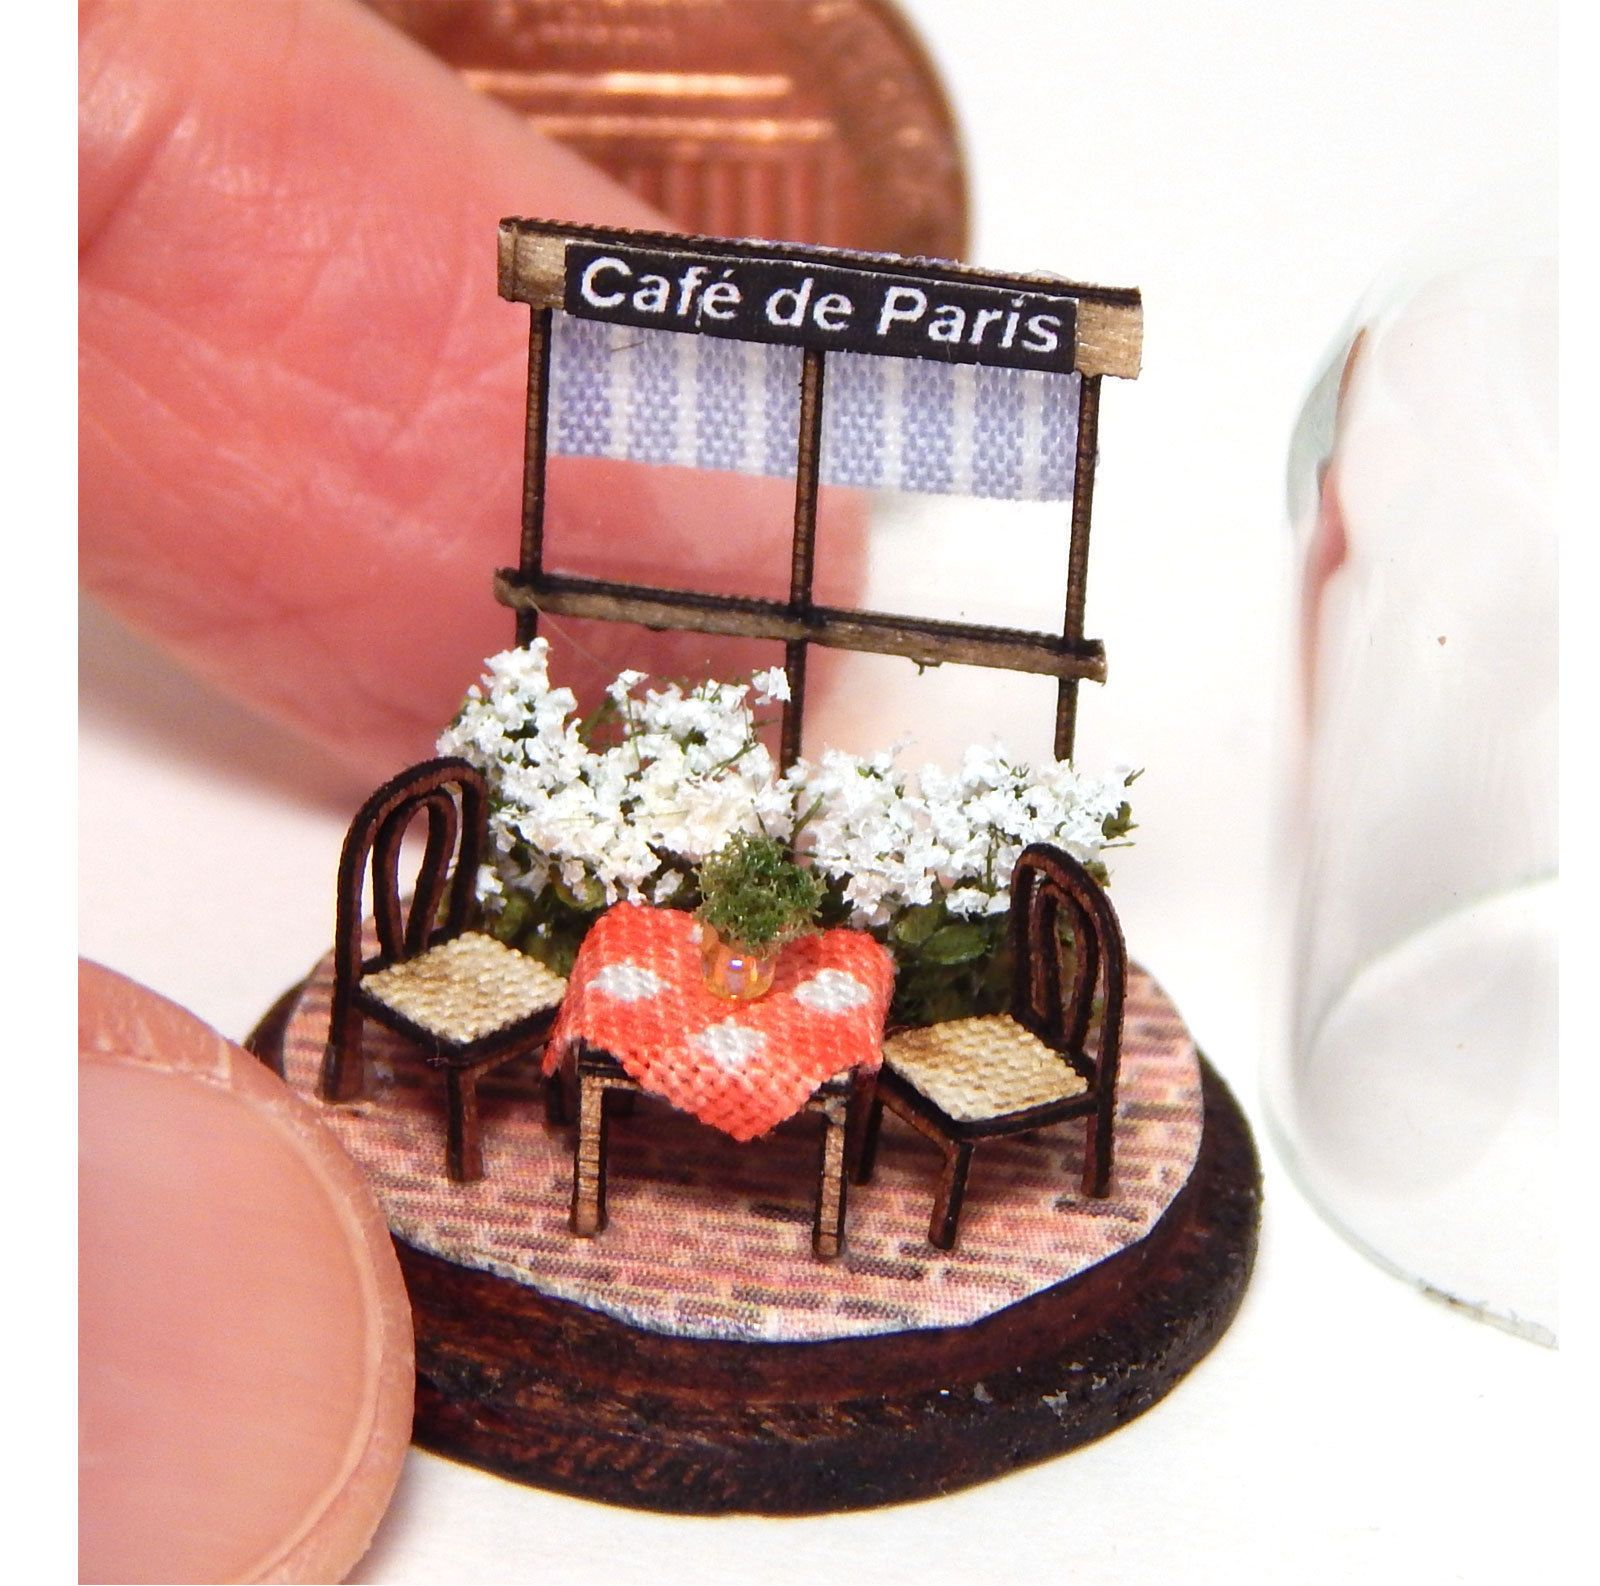 1 144th Scale Miniature Parisian Cafe Scene in Glass Dome Chair